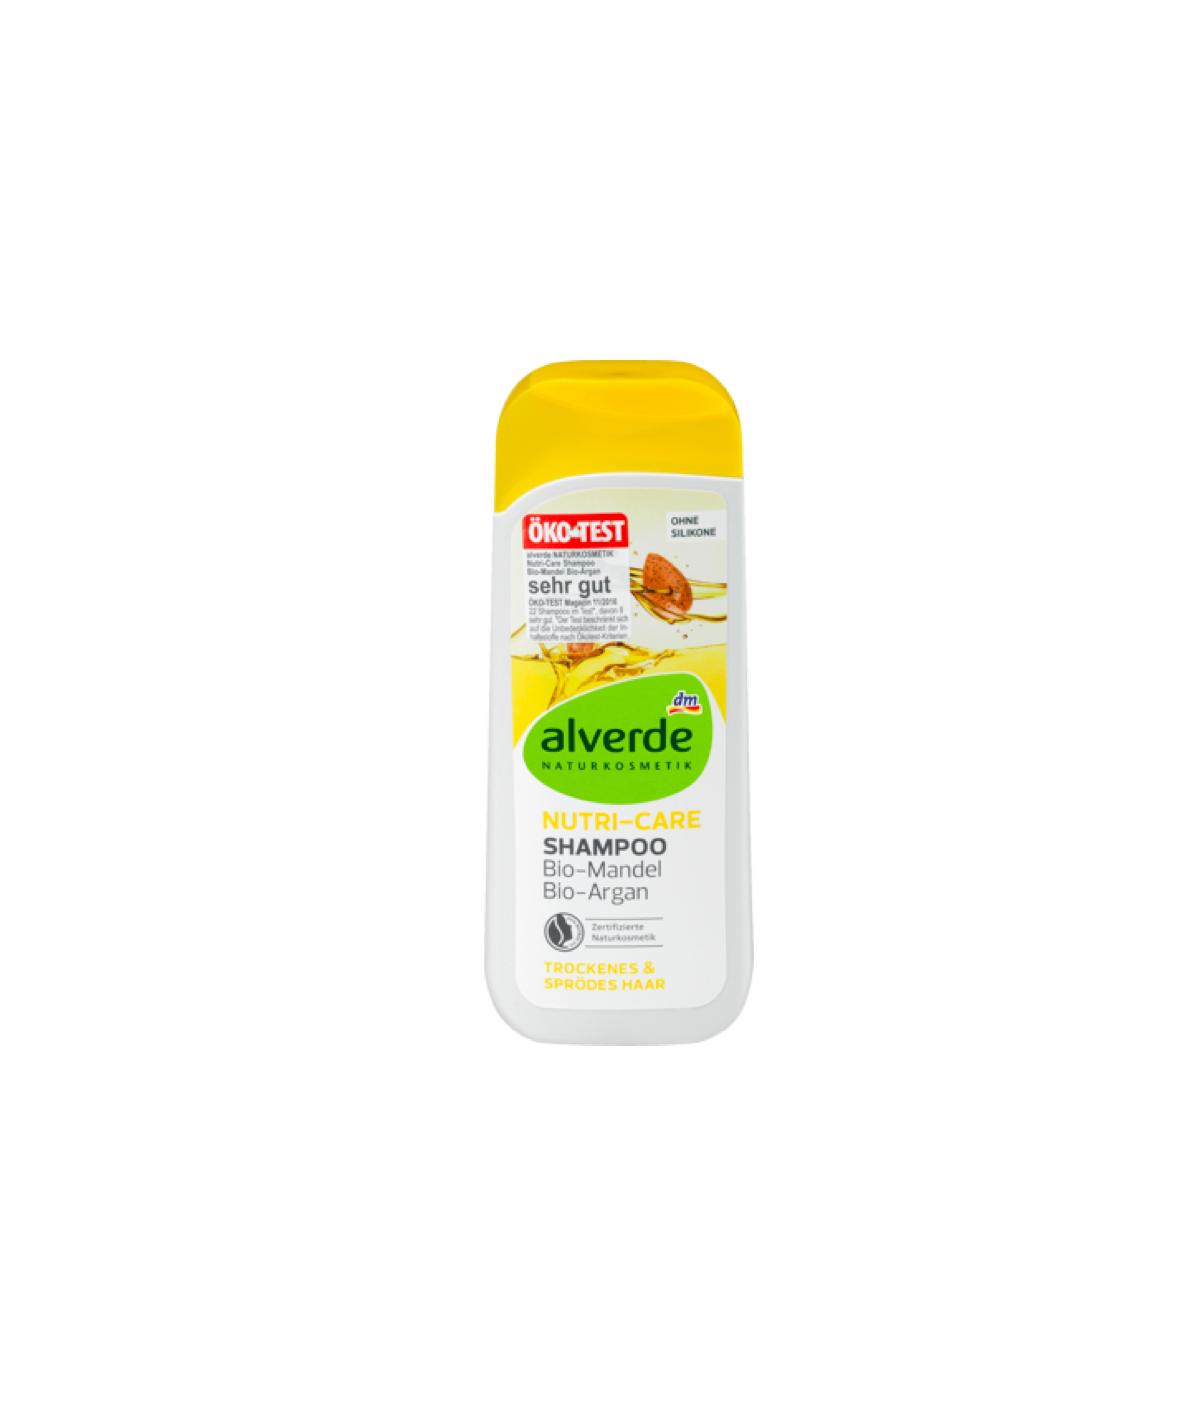 Shampoing Nutri-Care, 200 ml